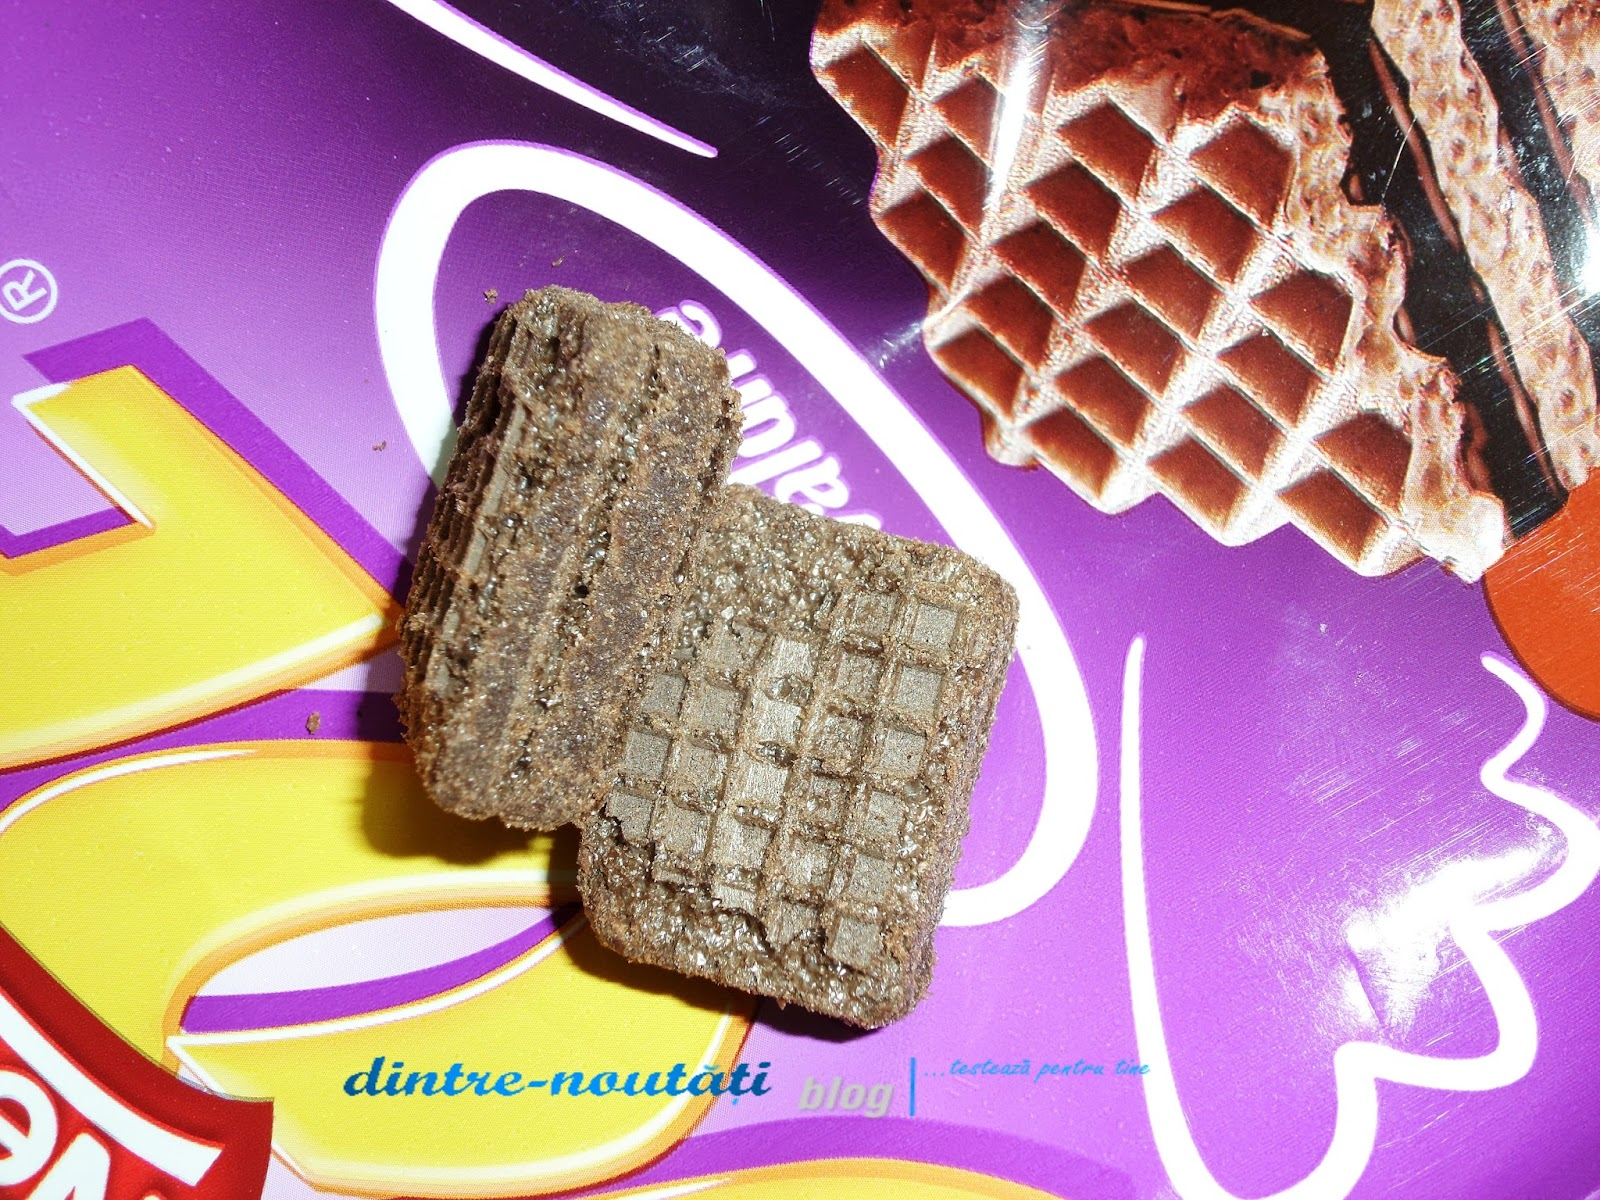 napolitana joe cu crema de cacao in stil negresa, ispite dezvaluite